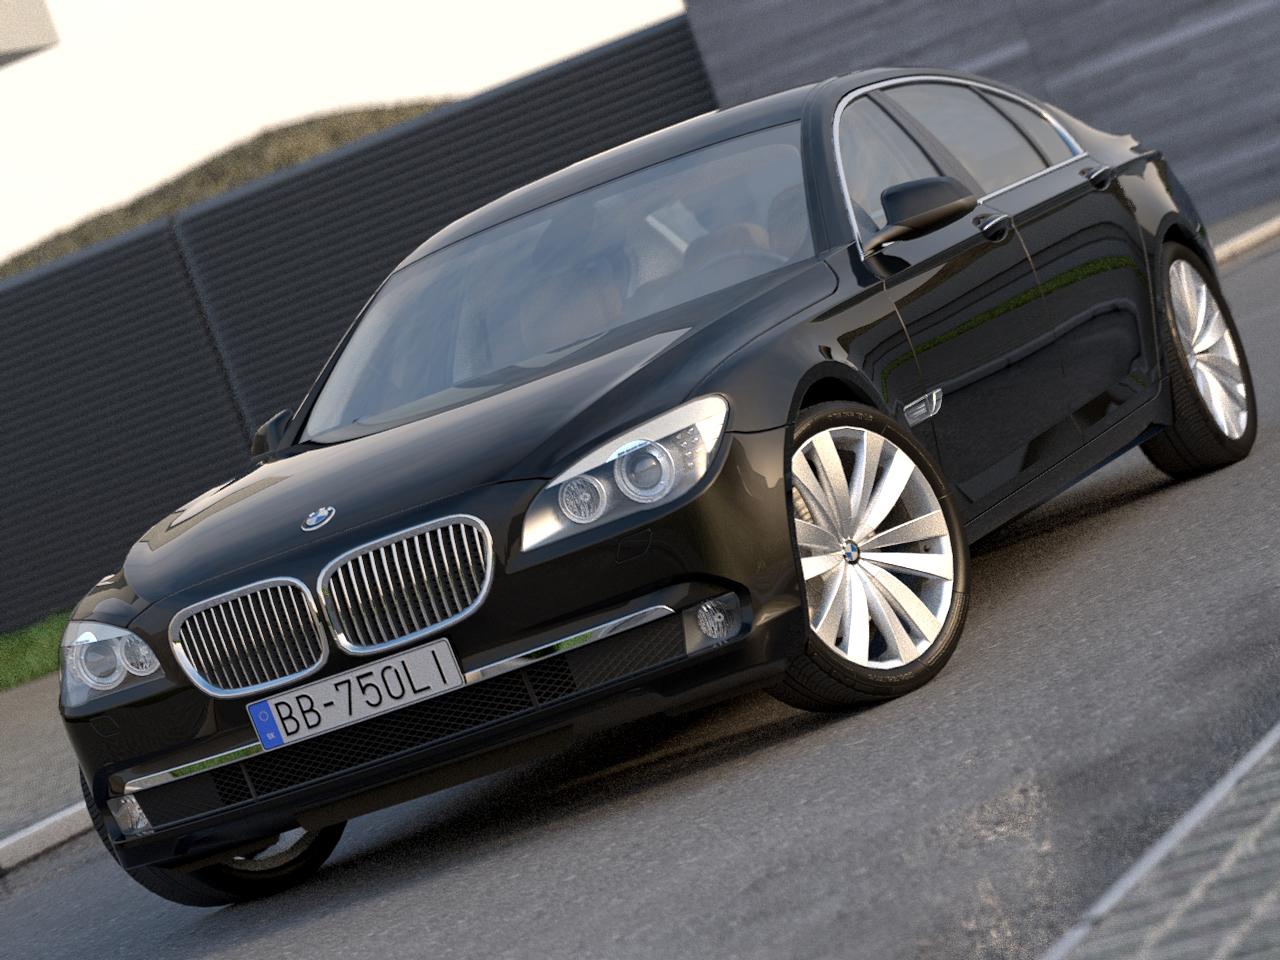 BMW 7 series Long (2009) 3d model 3ds max fbx c4d obj 185753